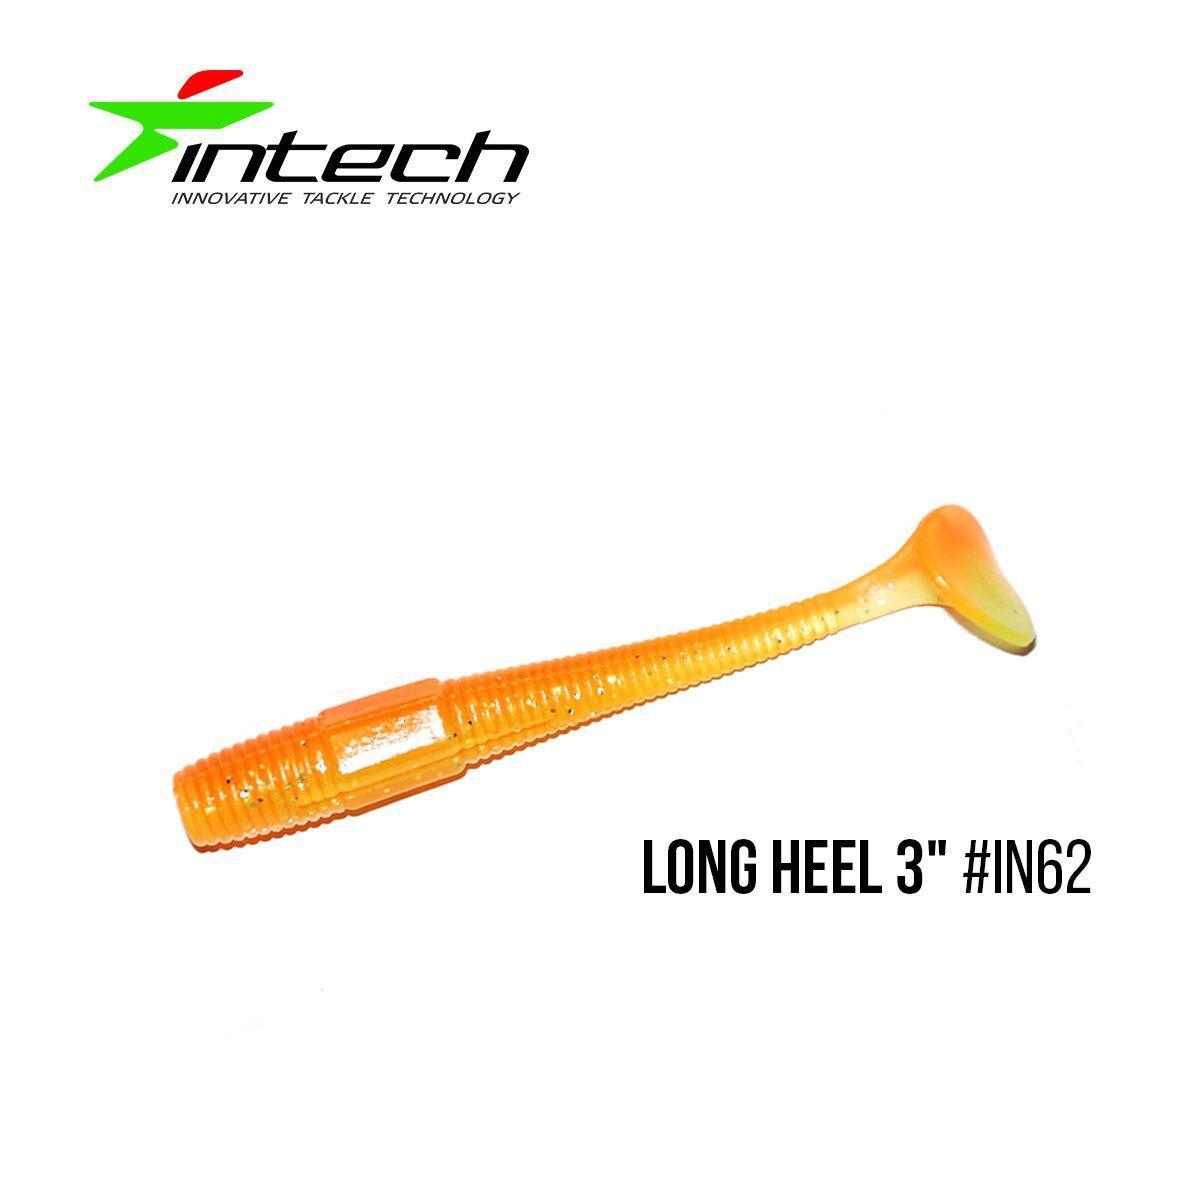 """.Приманка Intech Long Heel 3 ""(8 шт) (IN62)"